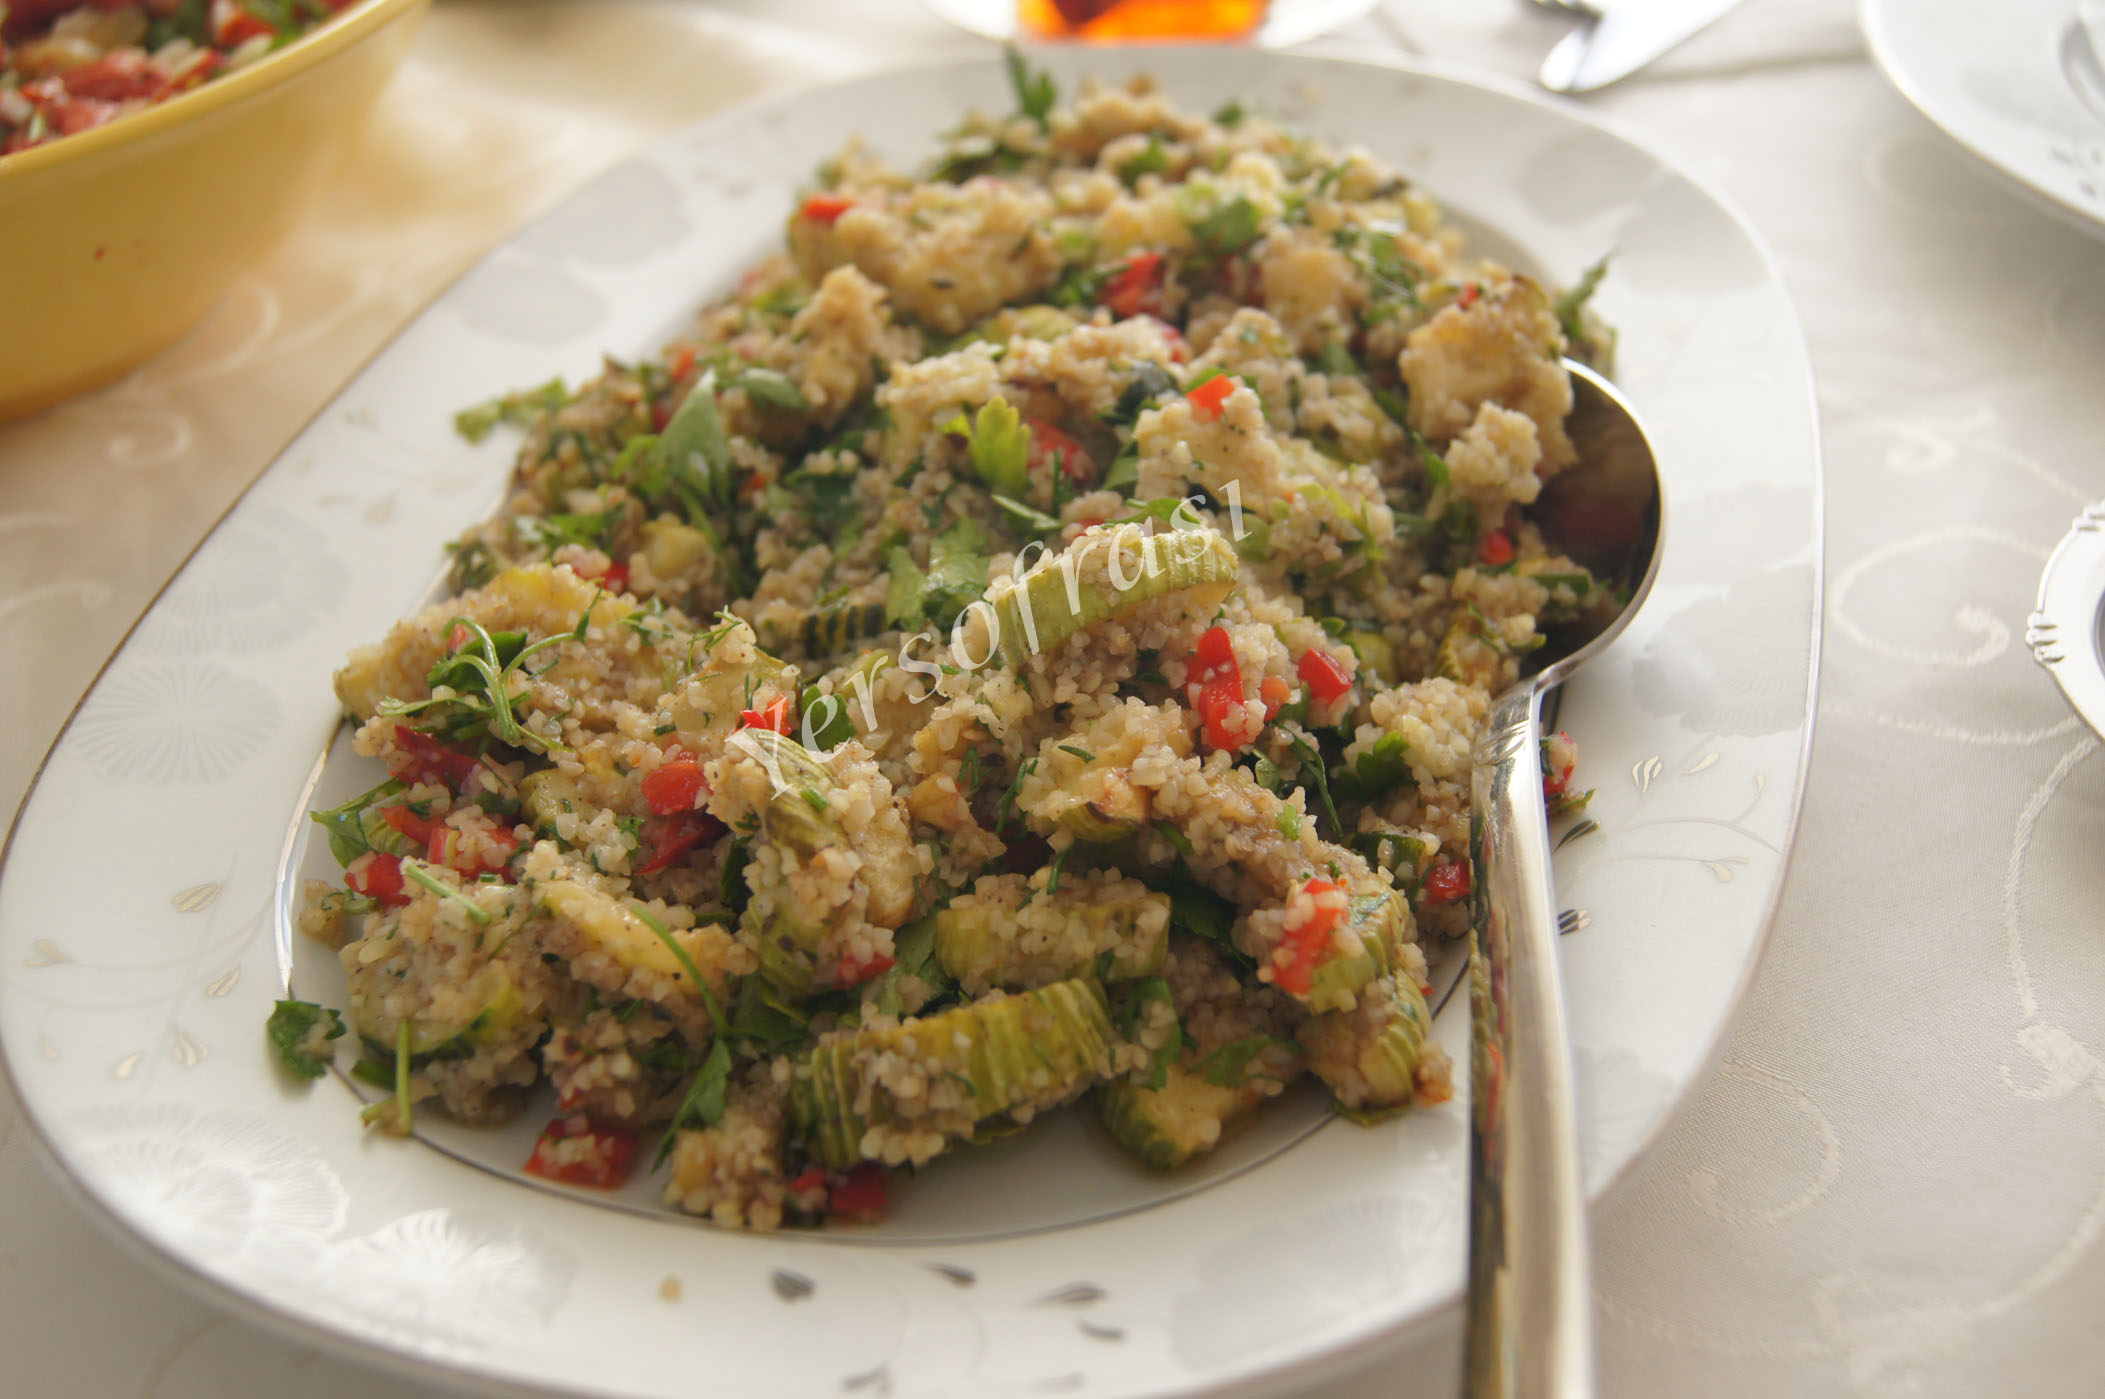 kabakli bulgurlu salata